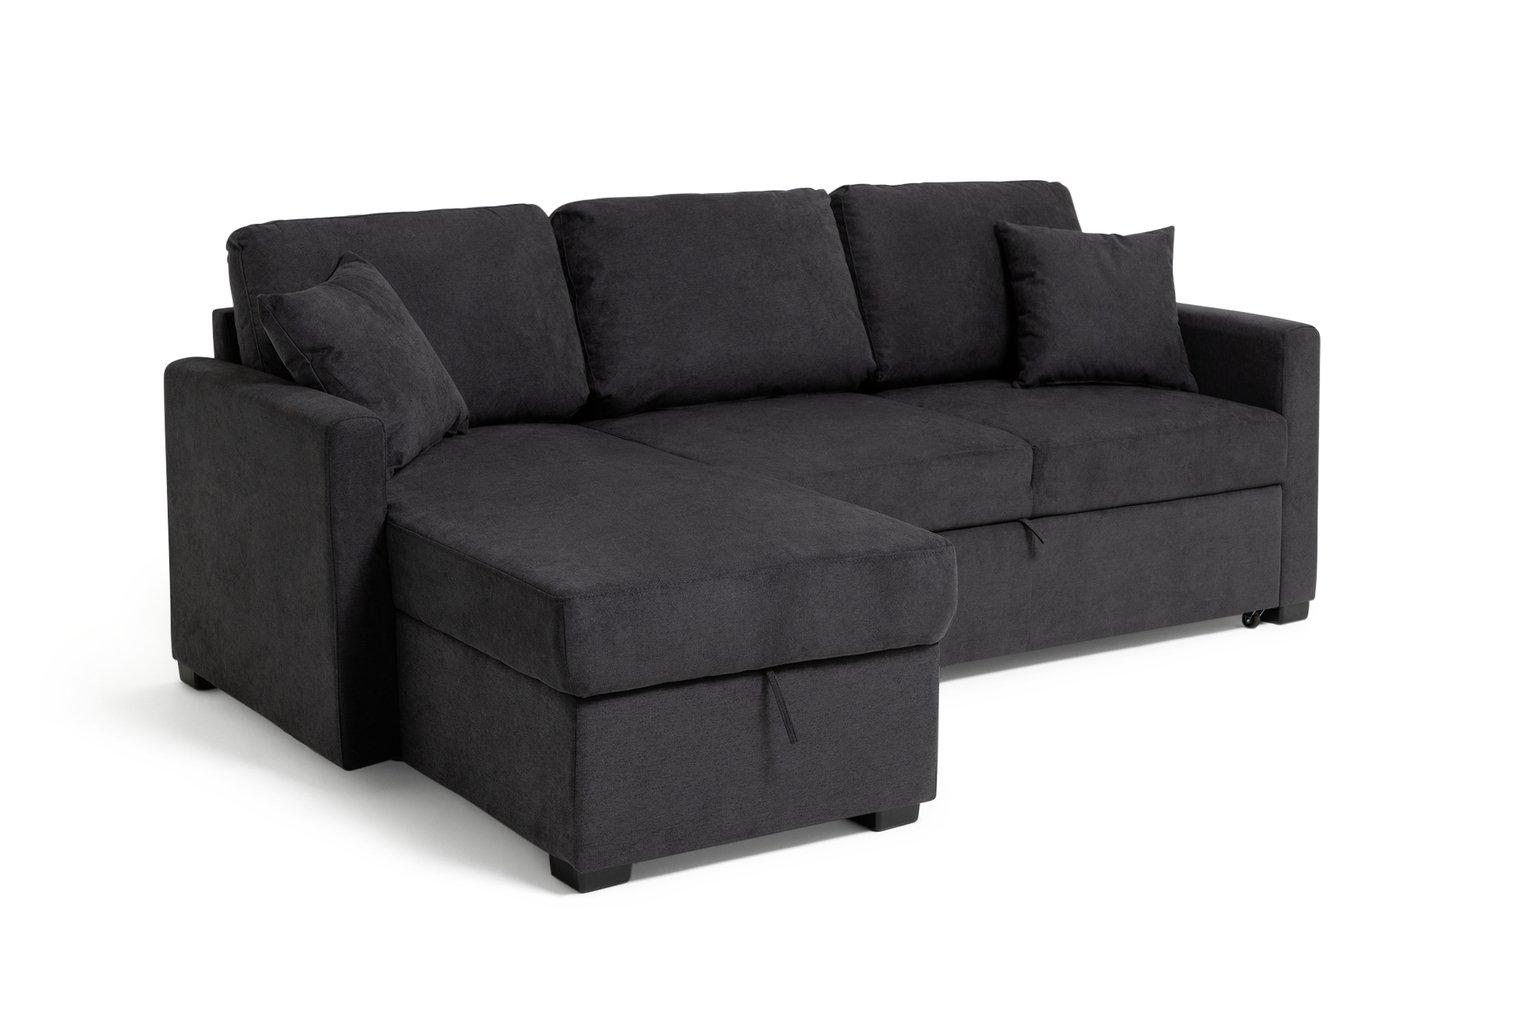 Argos Home Reagan Left Corner Fabric Sofa Bed - Charcoal